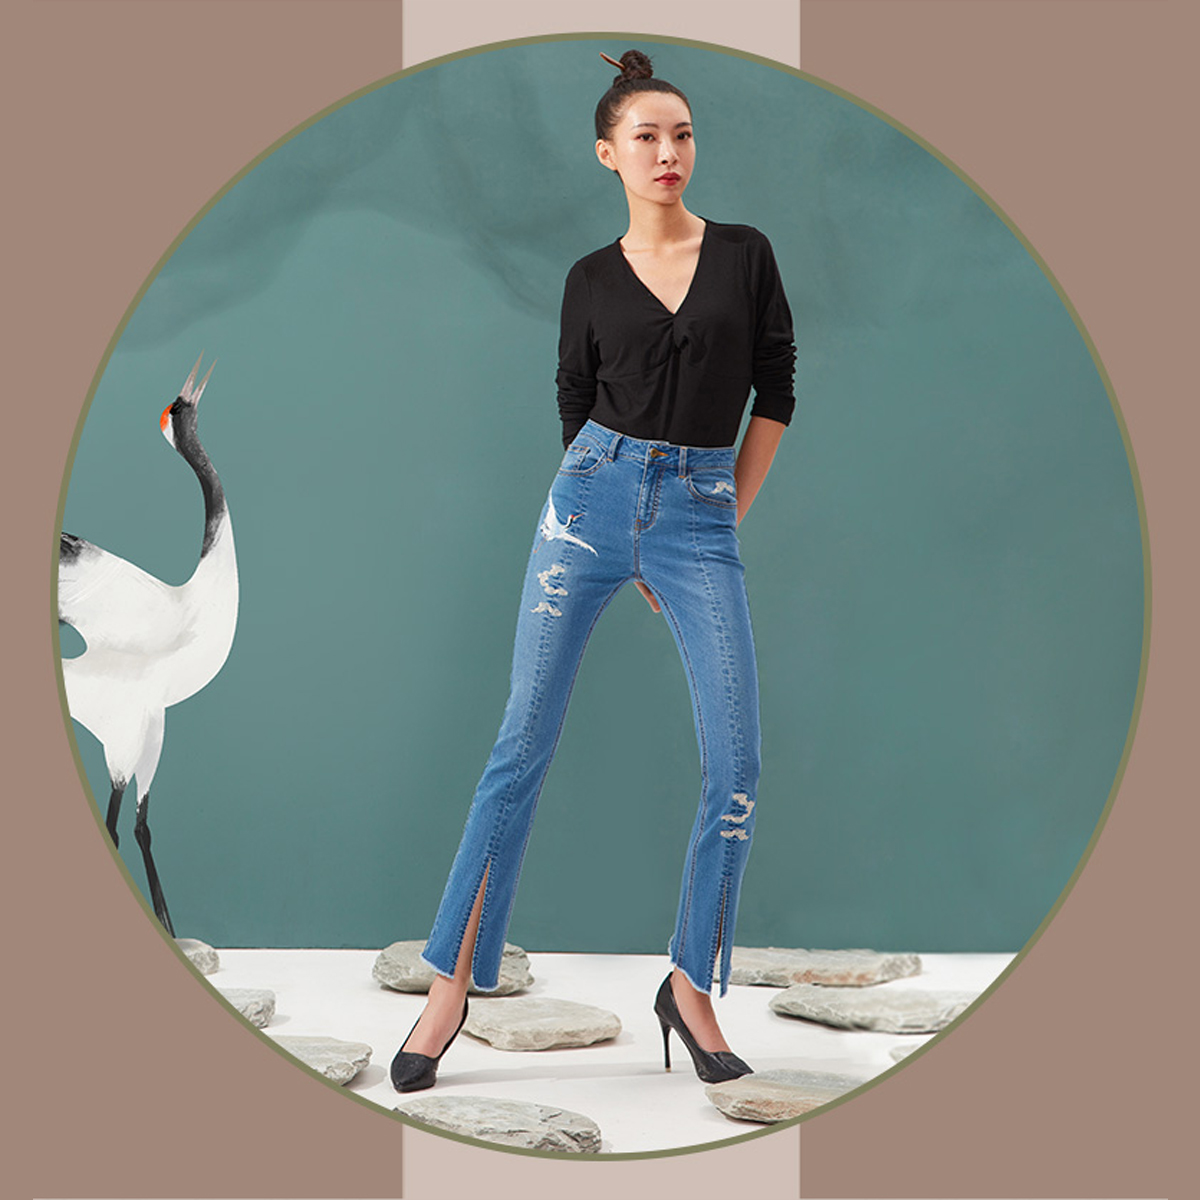 Jean - Shandong Pop Jeans Intelligent Manufacturing Co., Ltd.